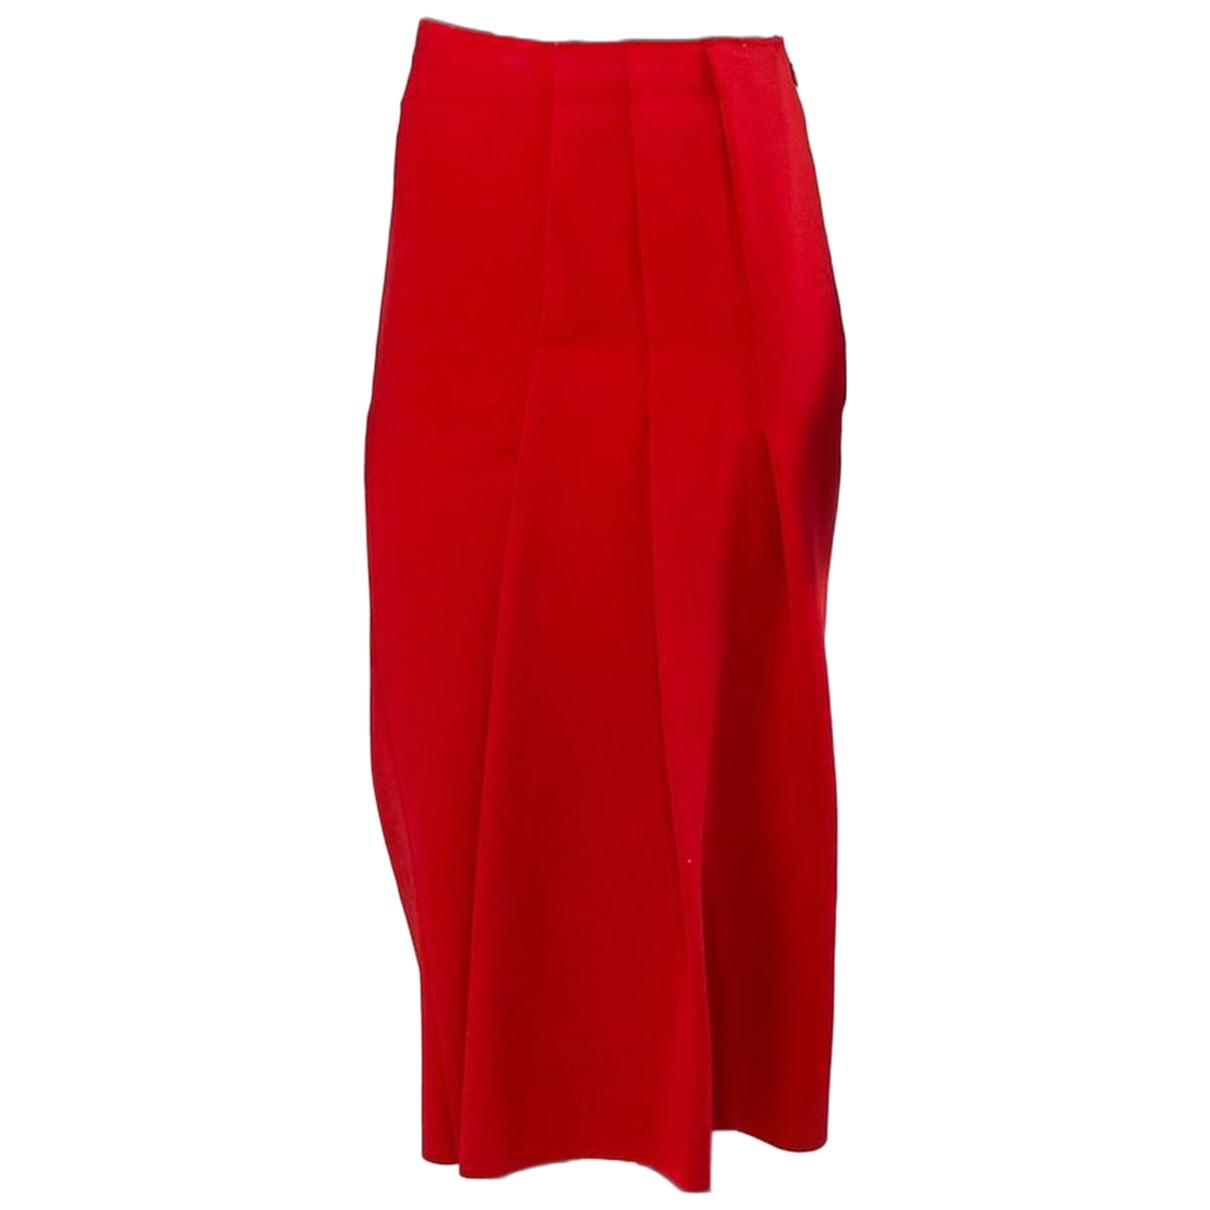 Victoria Beckham N Red skirt for Women XS International